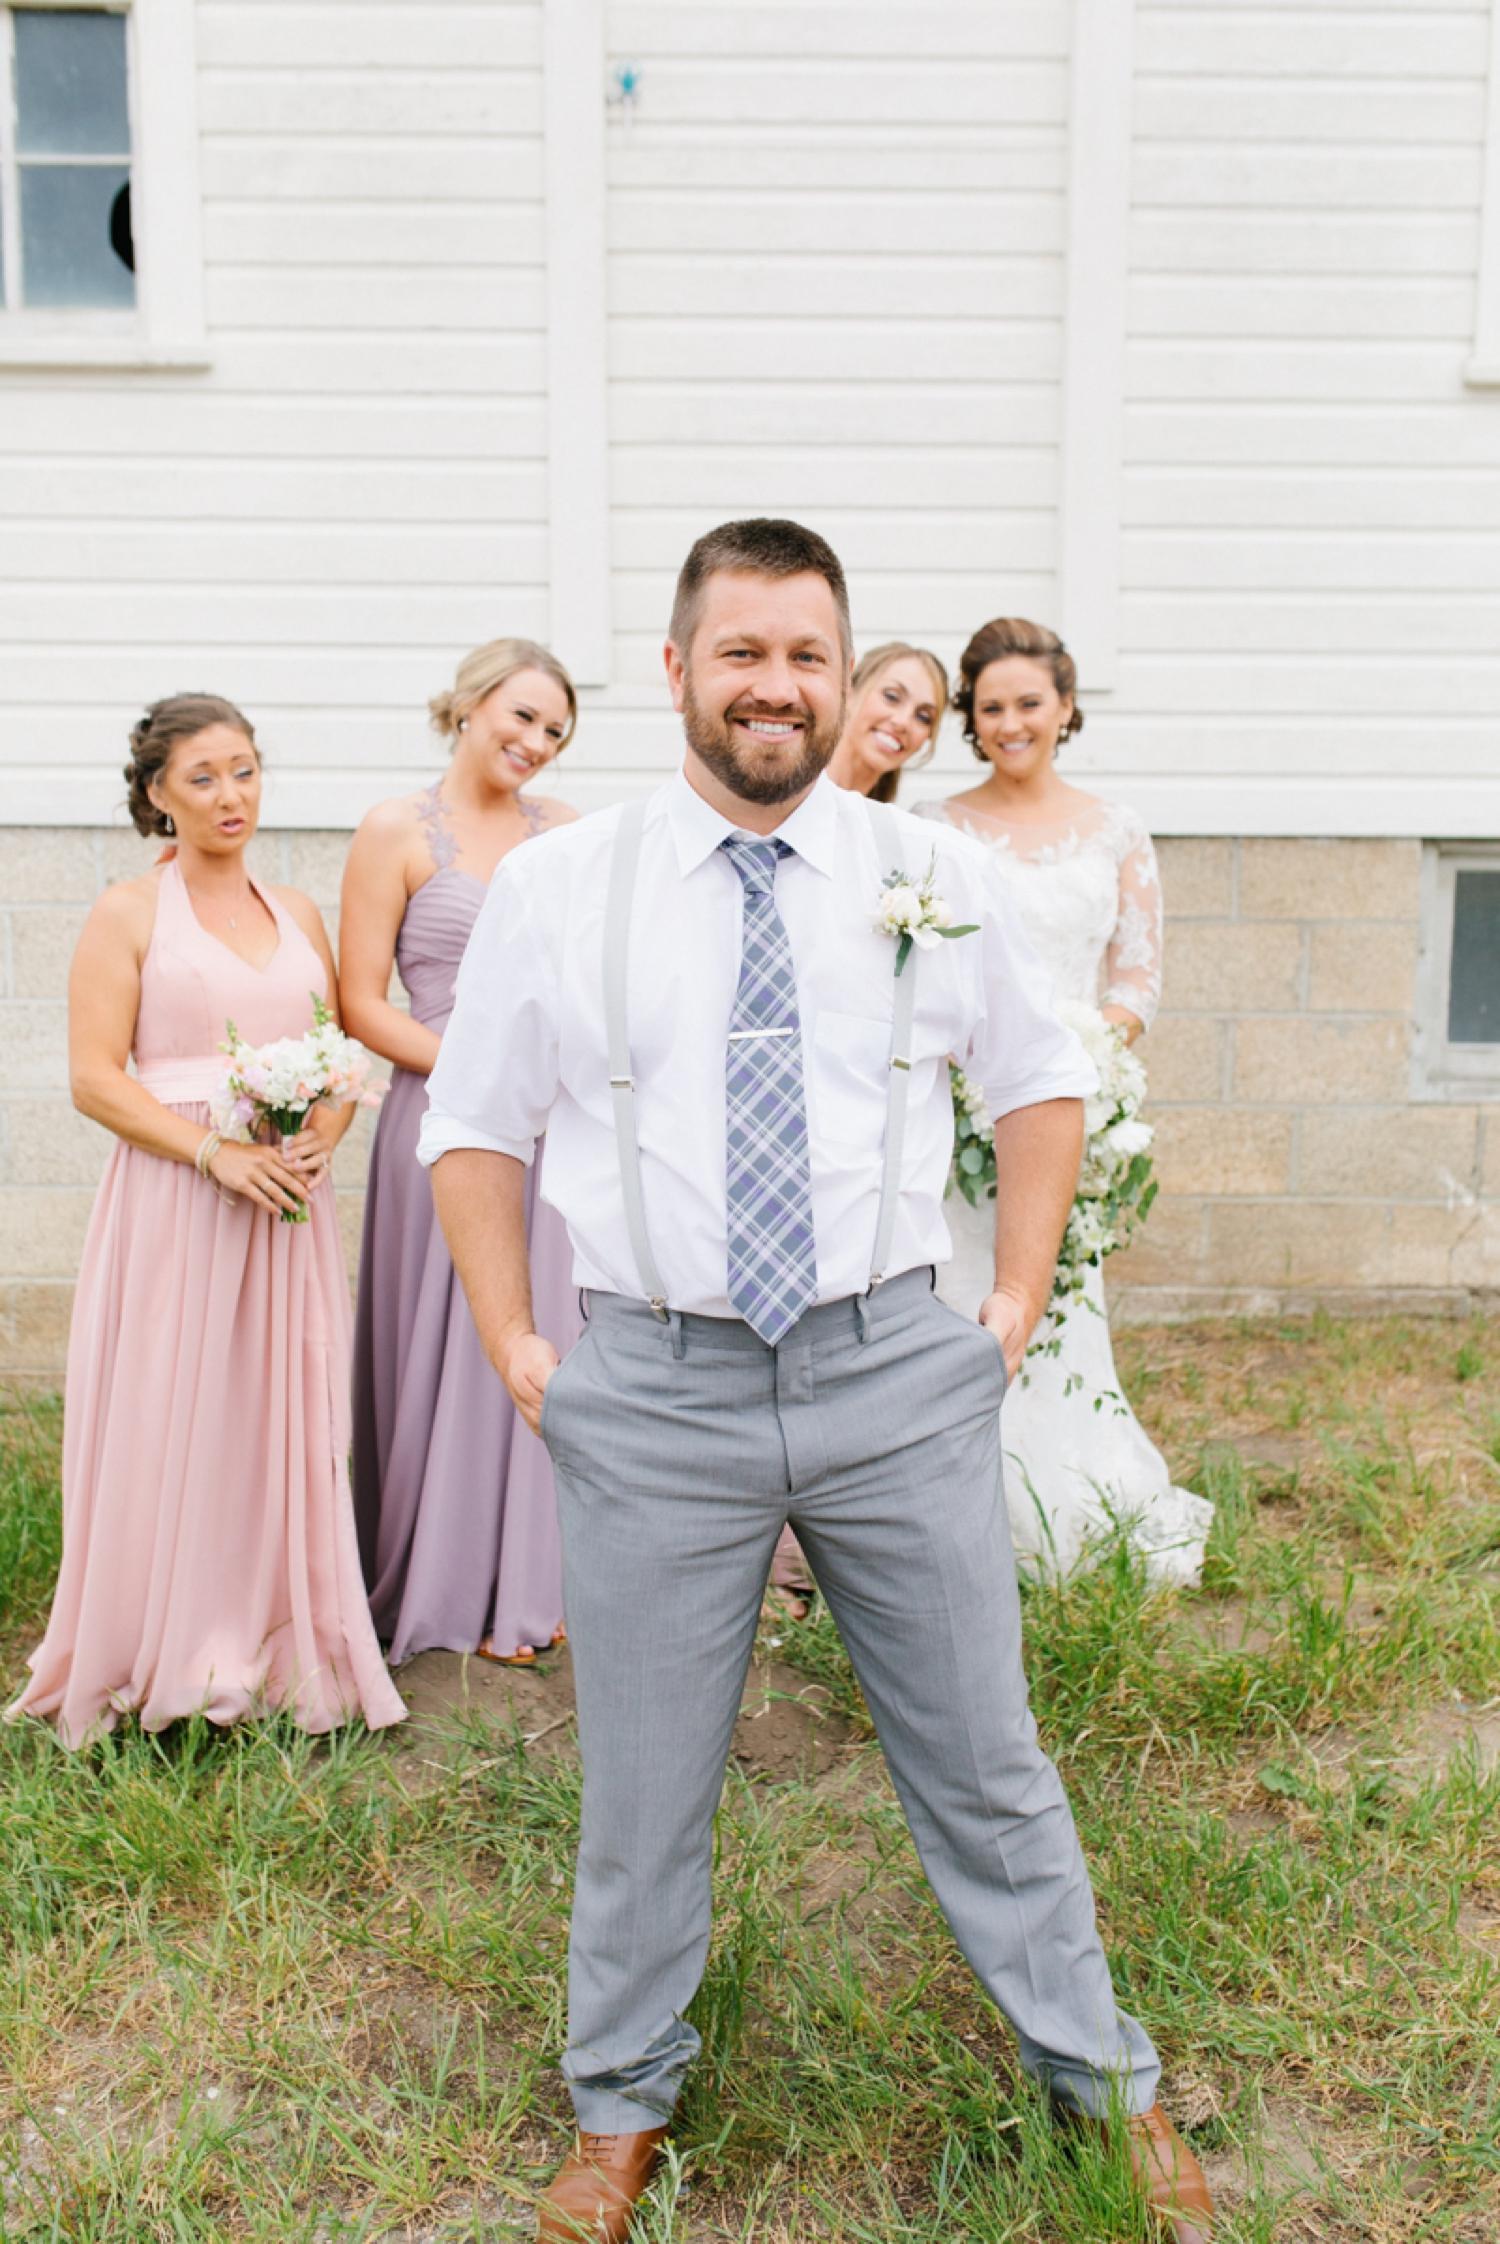 Wenatchee Wedding Photographer   Hampton Hideaway   Summer Rustic Wedding Eastern Washington   Emma Rose Company   Pastel Wedding Inspiration   Lace Wedding   Pacific Northwest Wedding 51.jpg